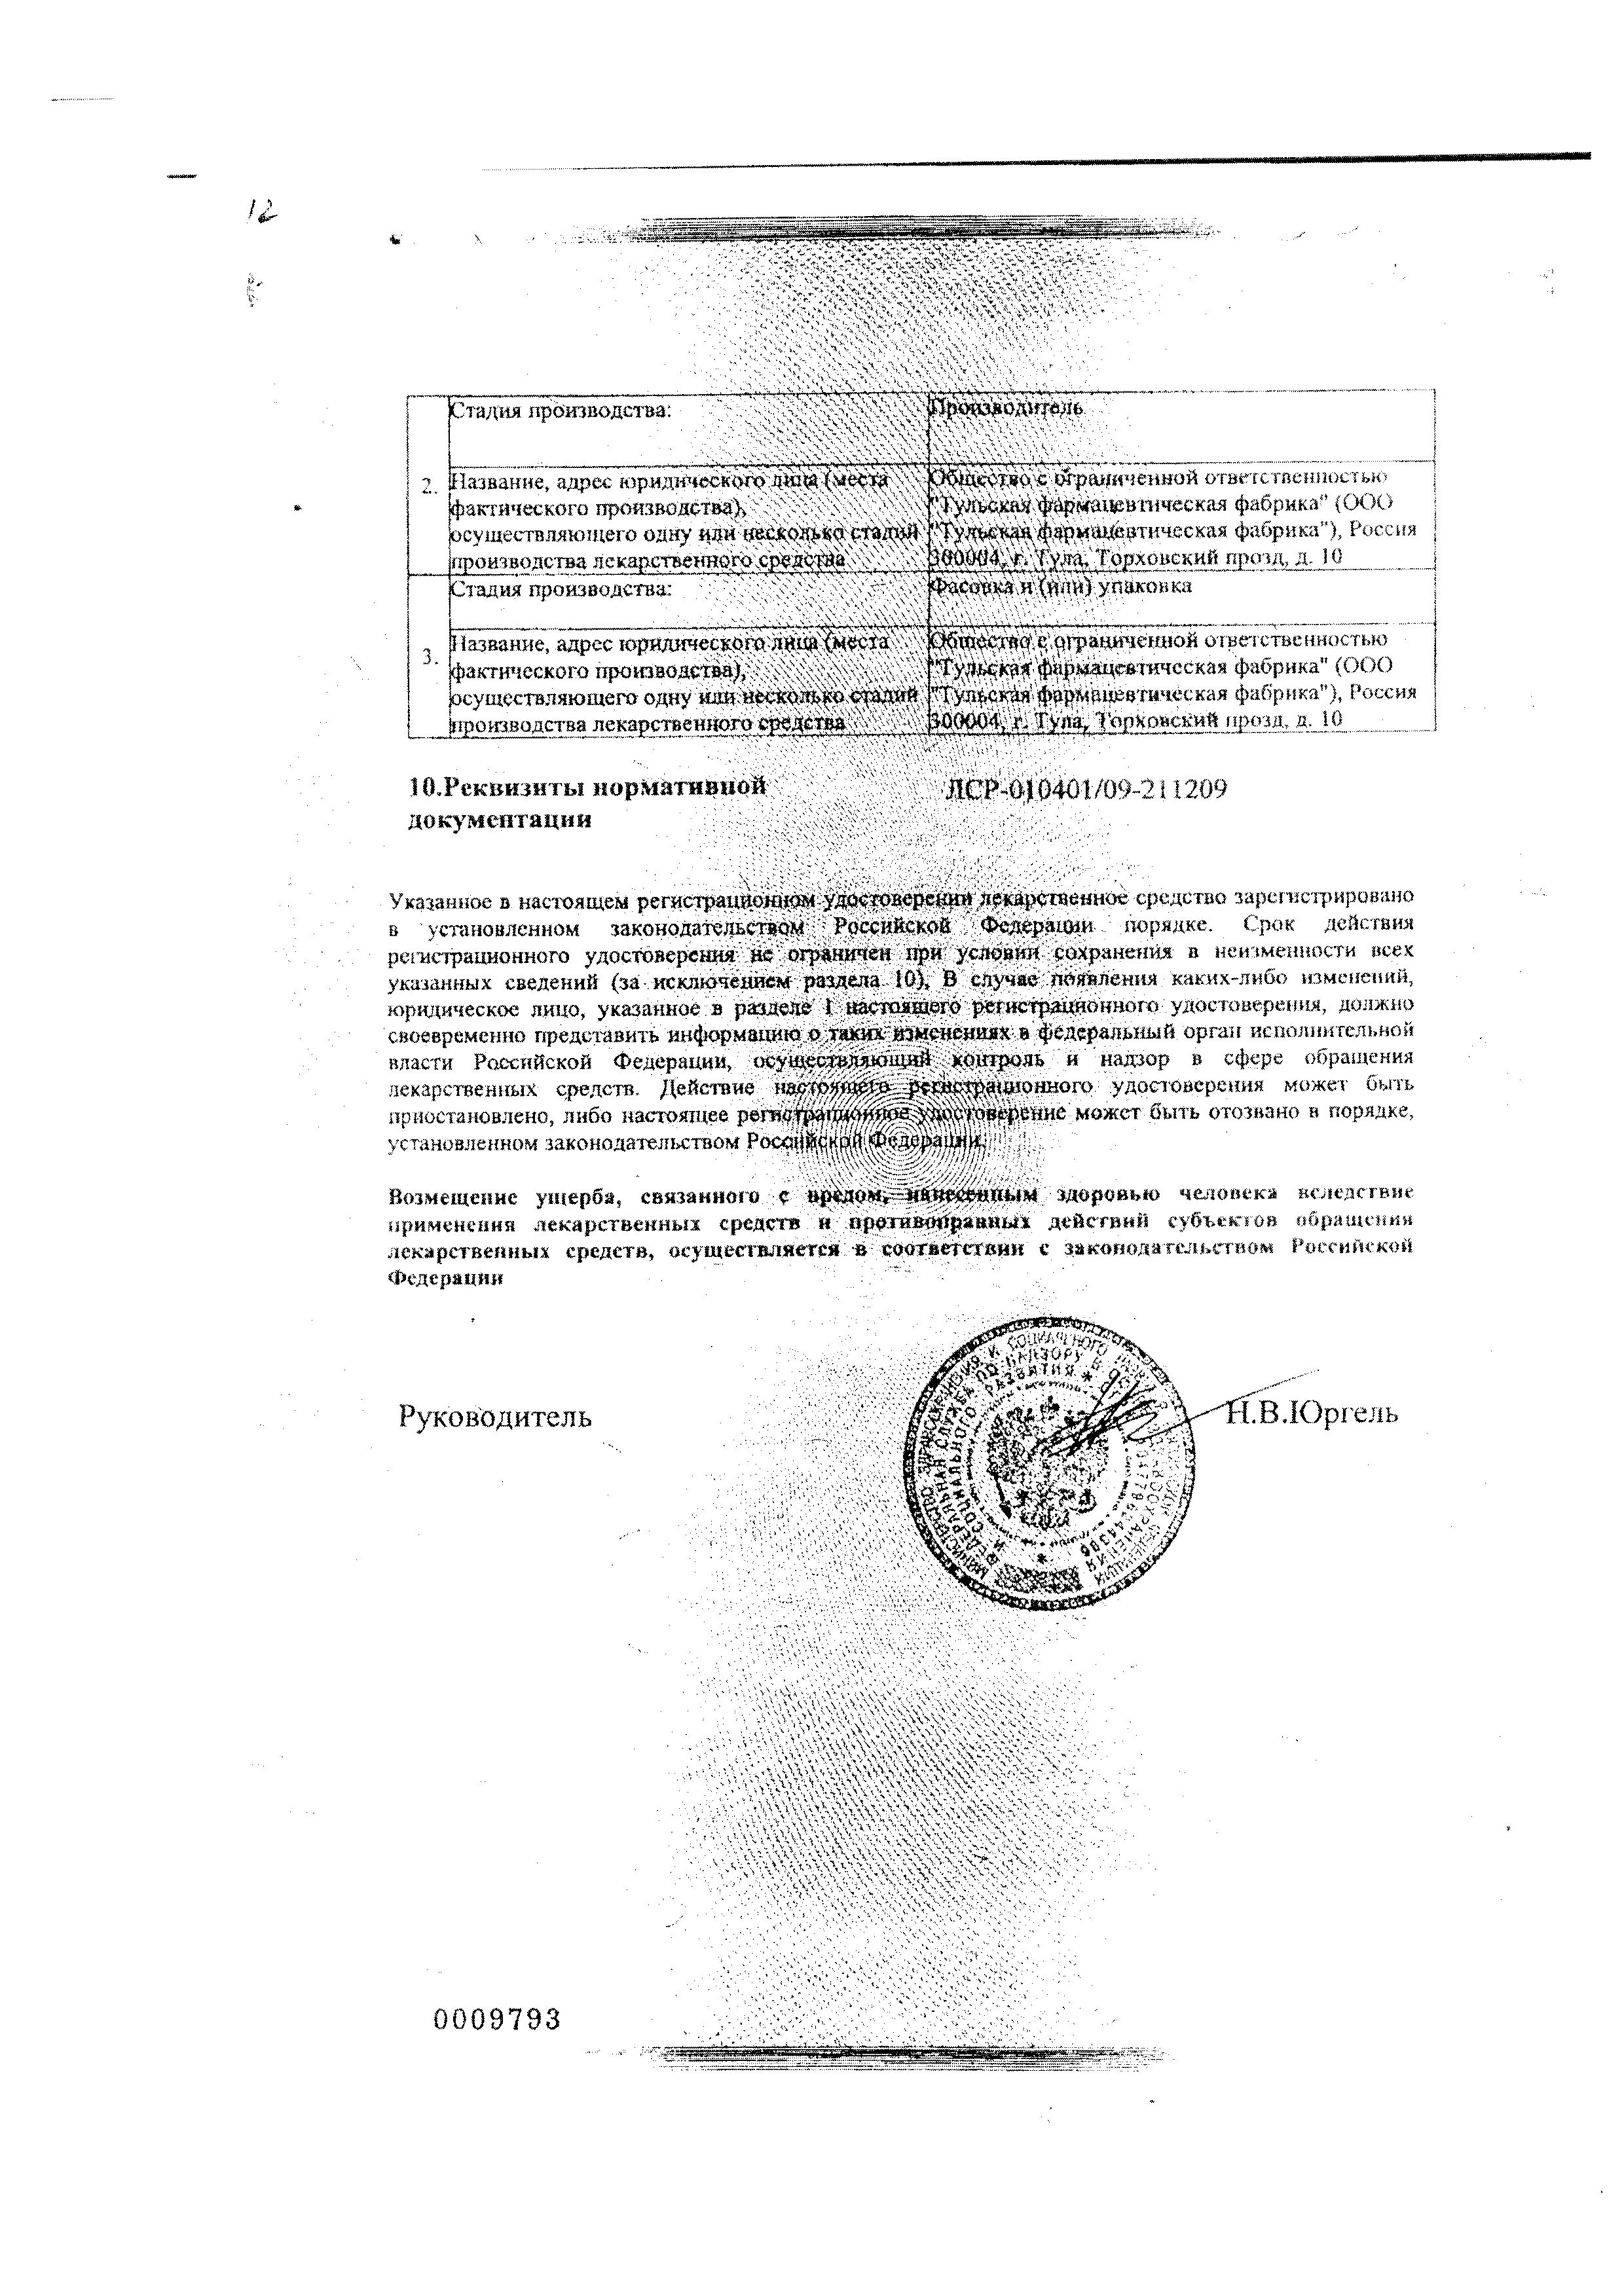 Меновазин сертификат